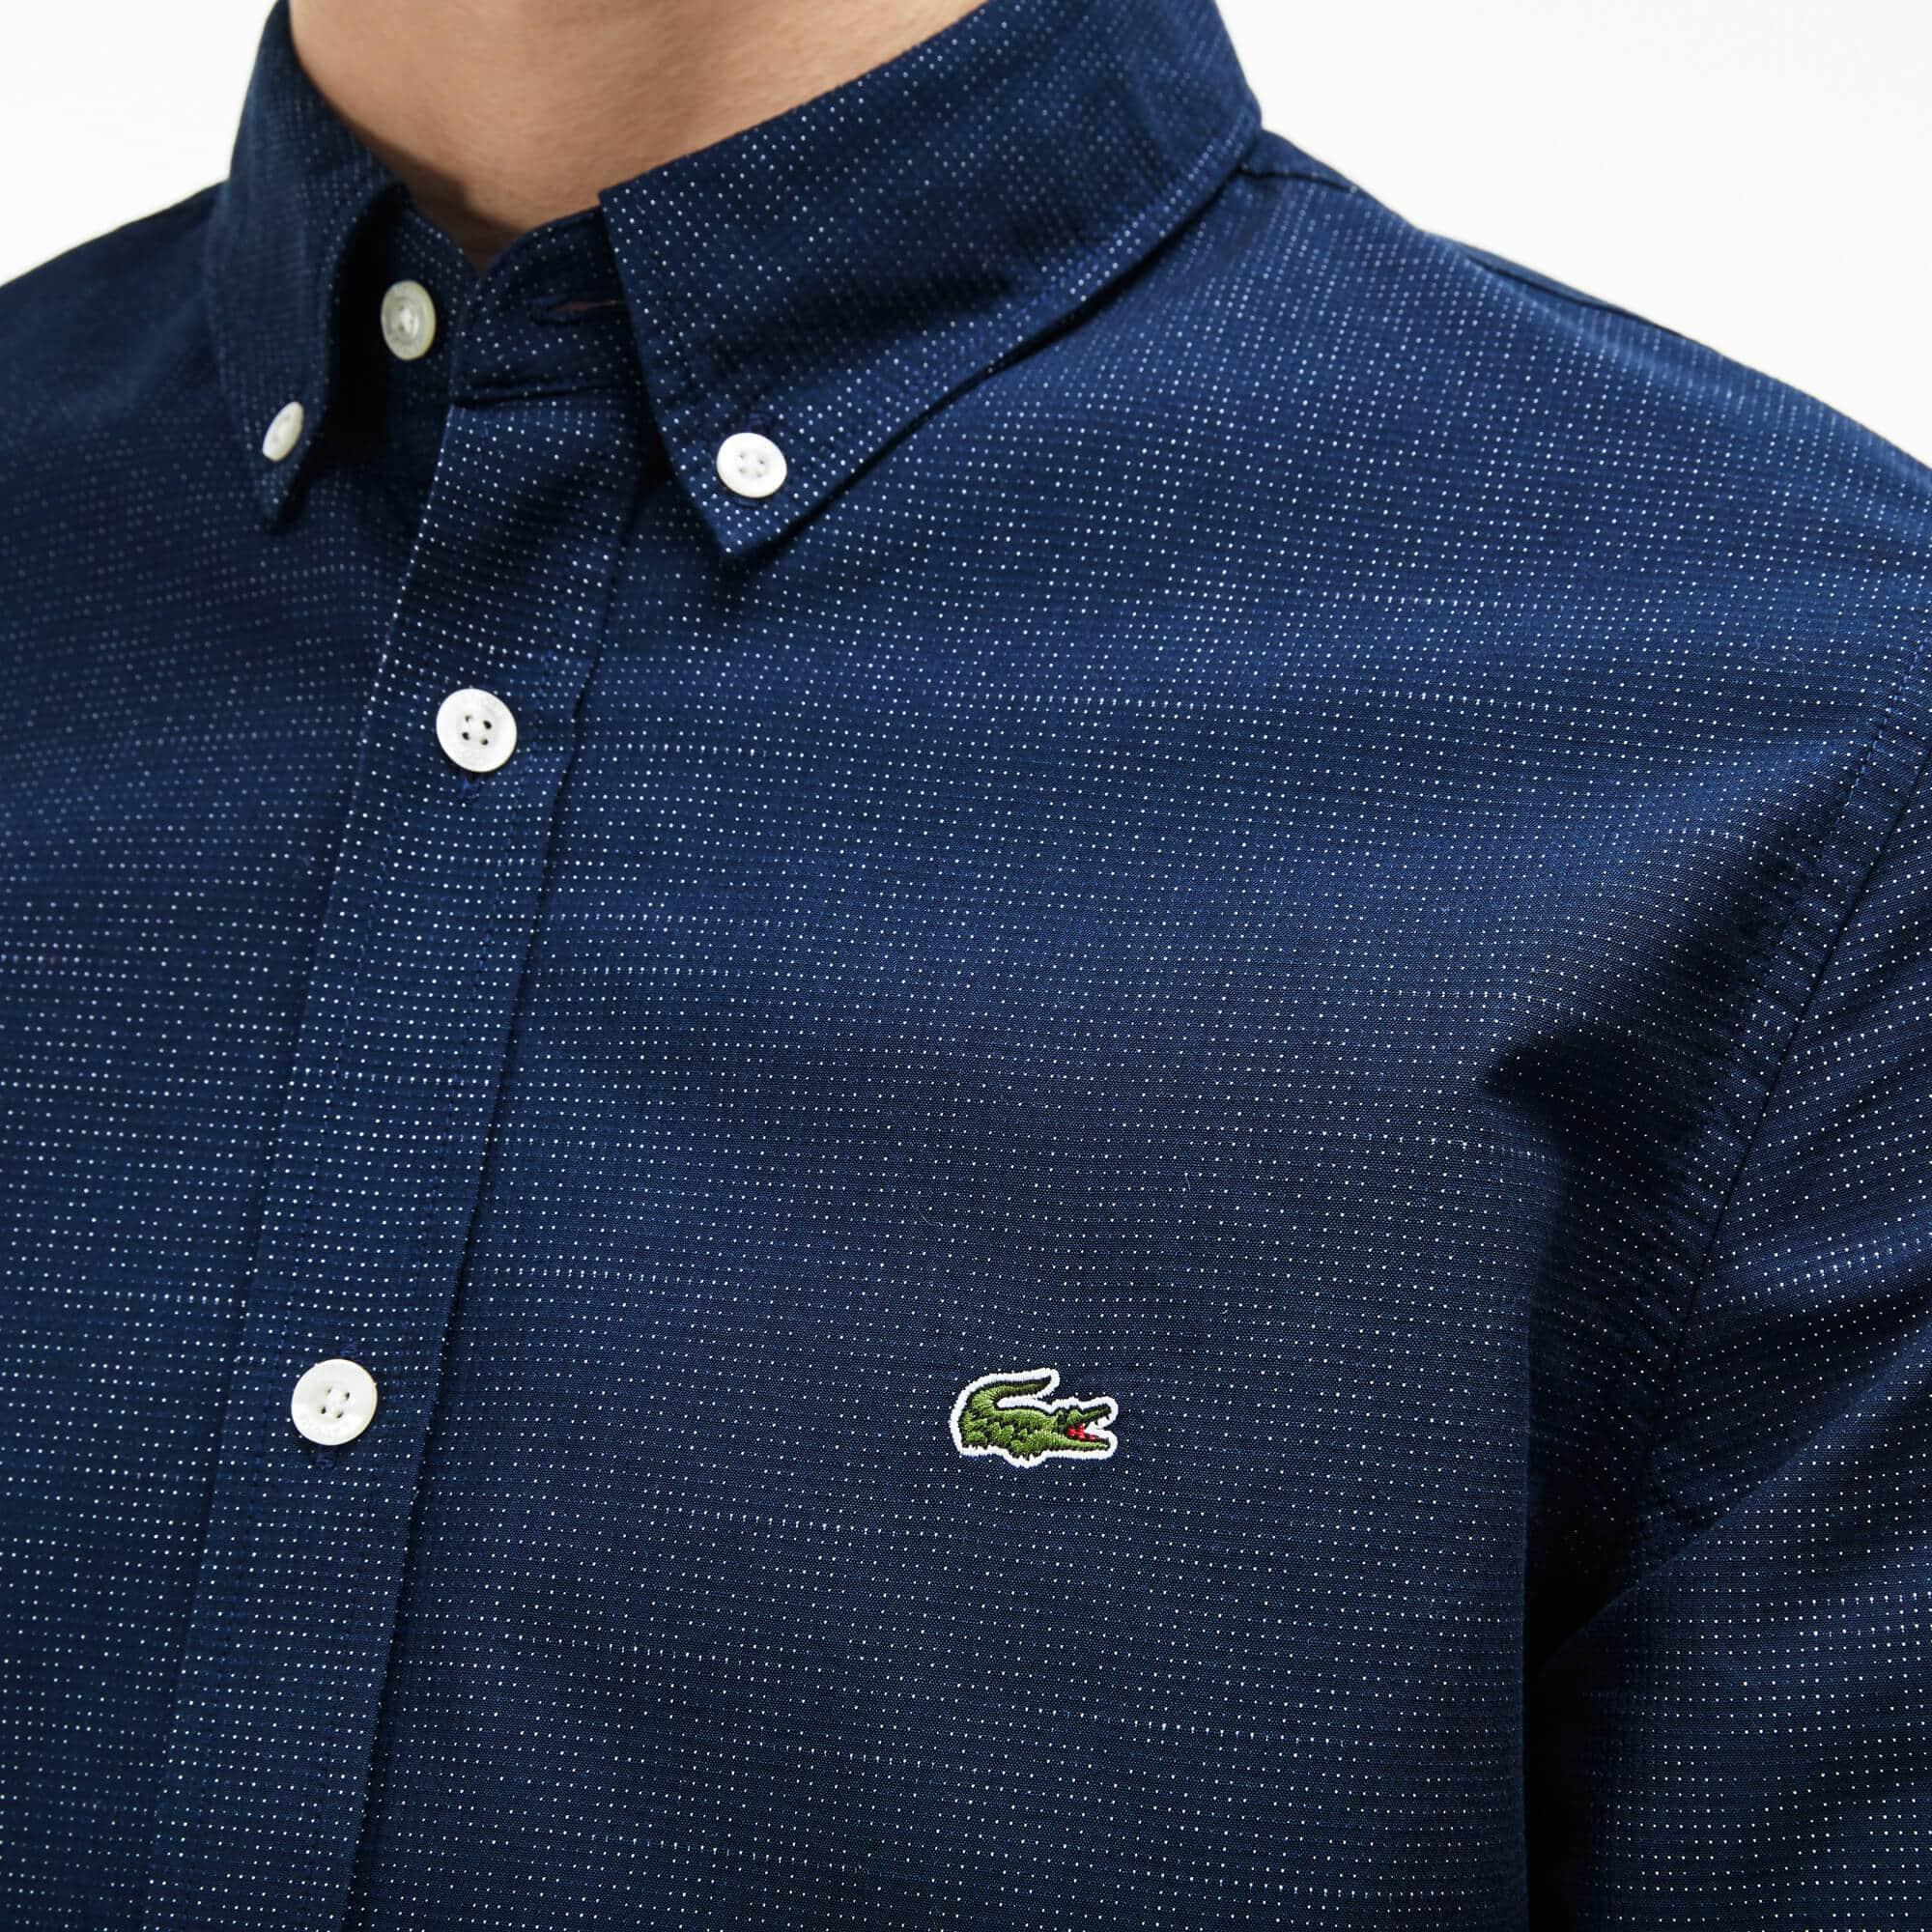 Camisa Hombre Popelín Jacquard Con Lunares Slim Fit